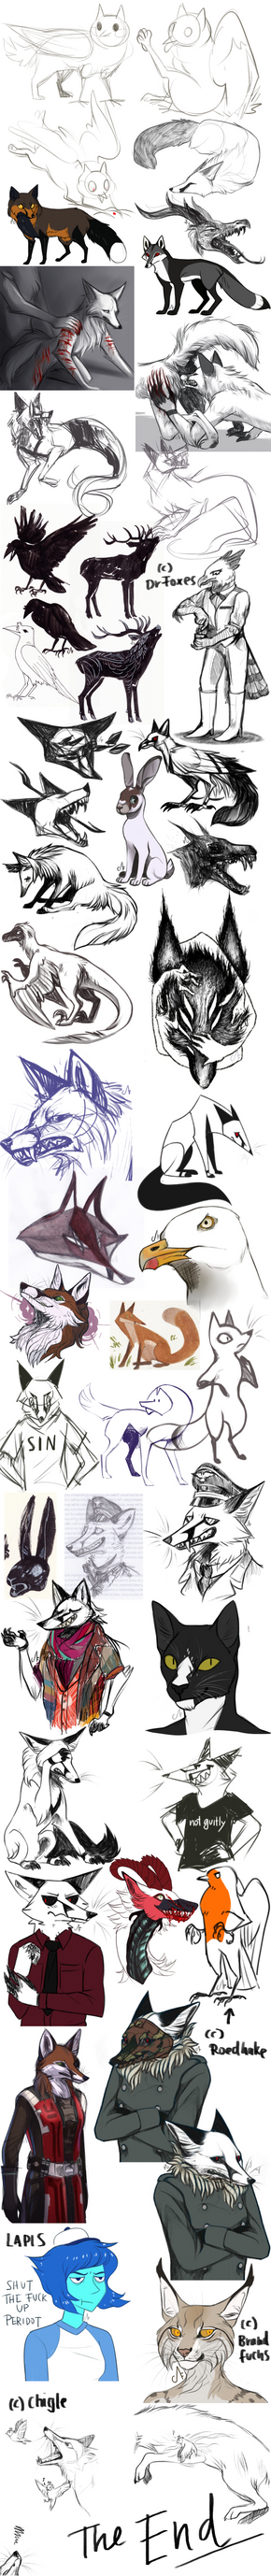 Tumblr Sketchdump 32 by CorruptedFox